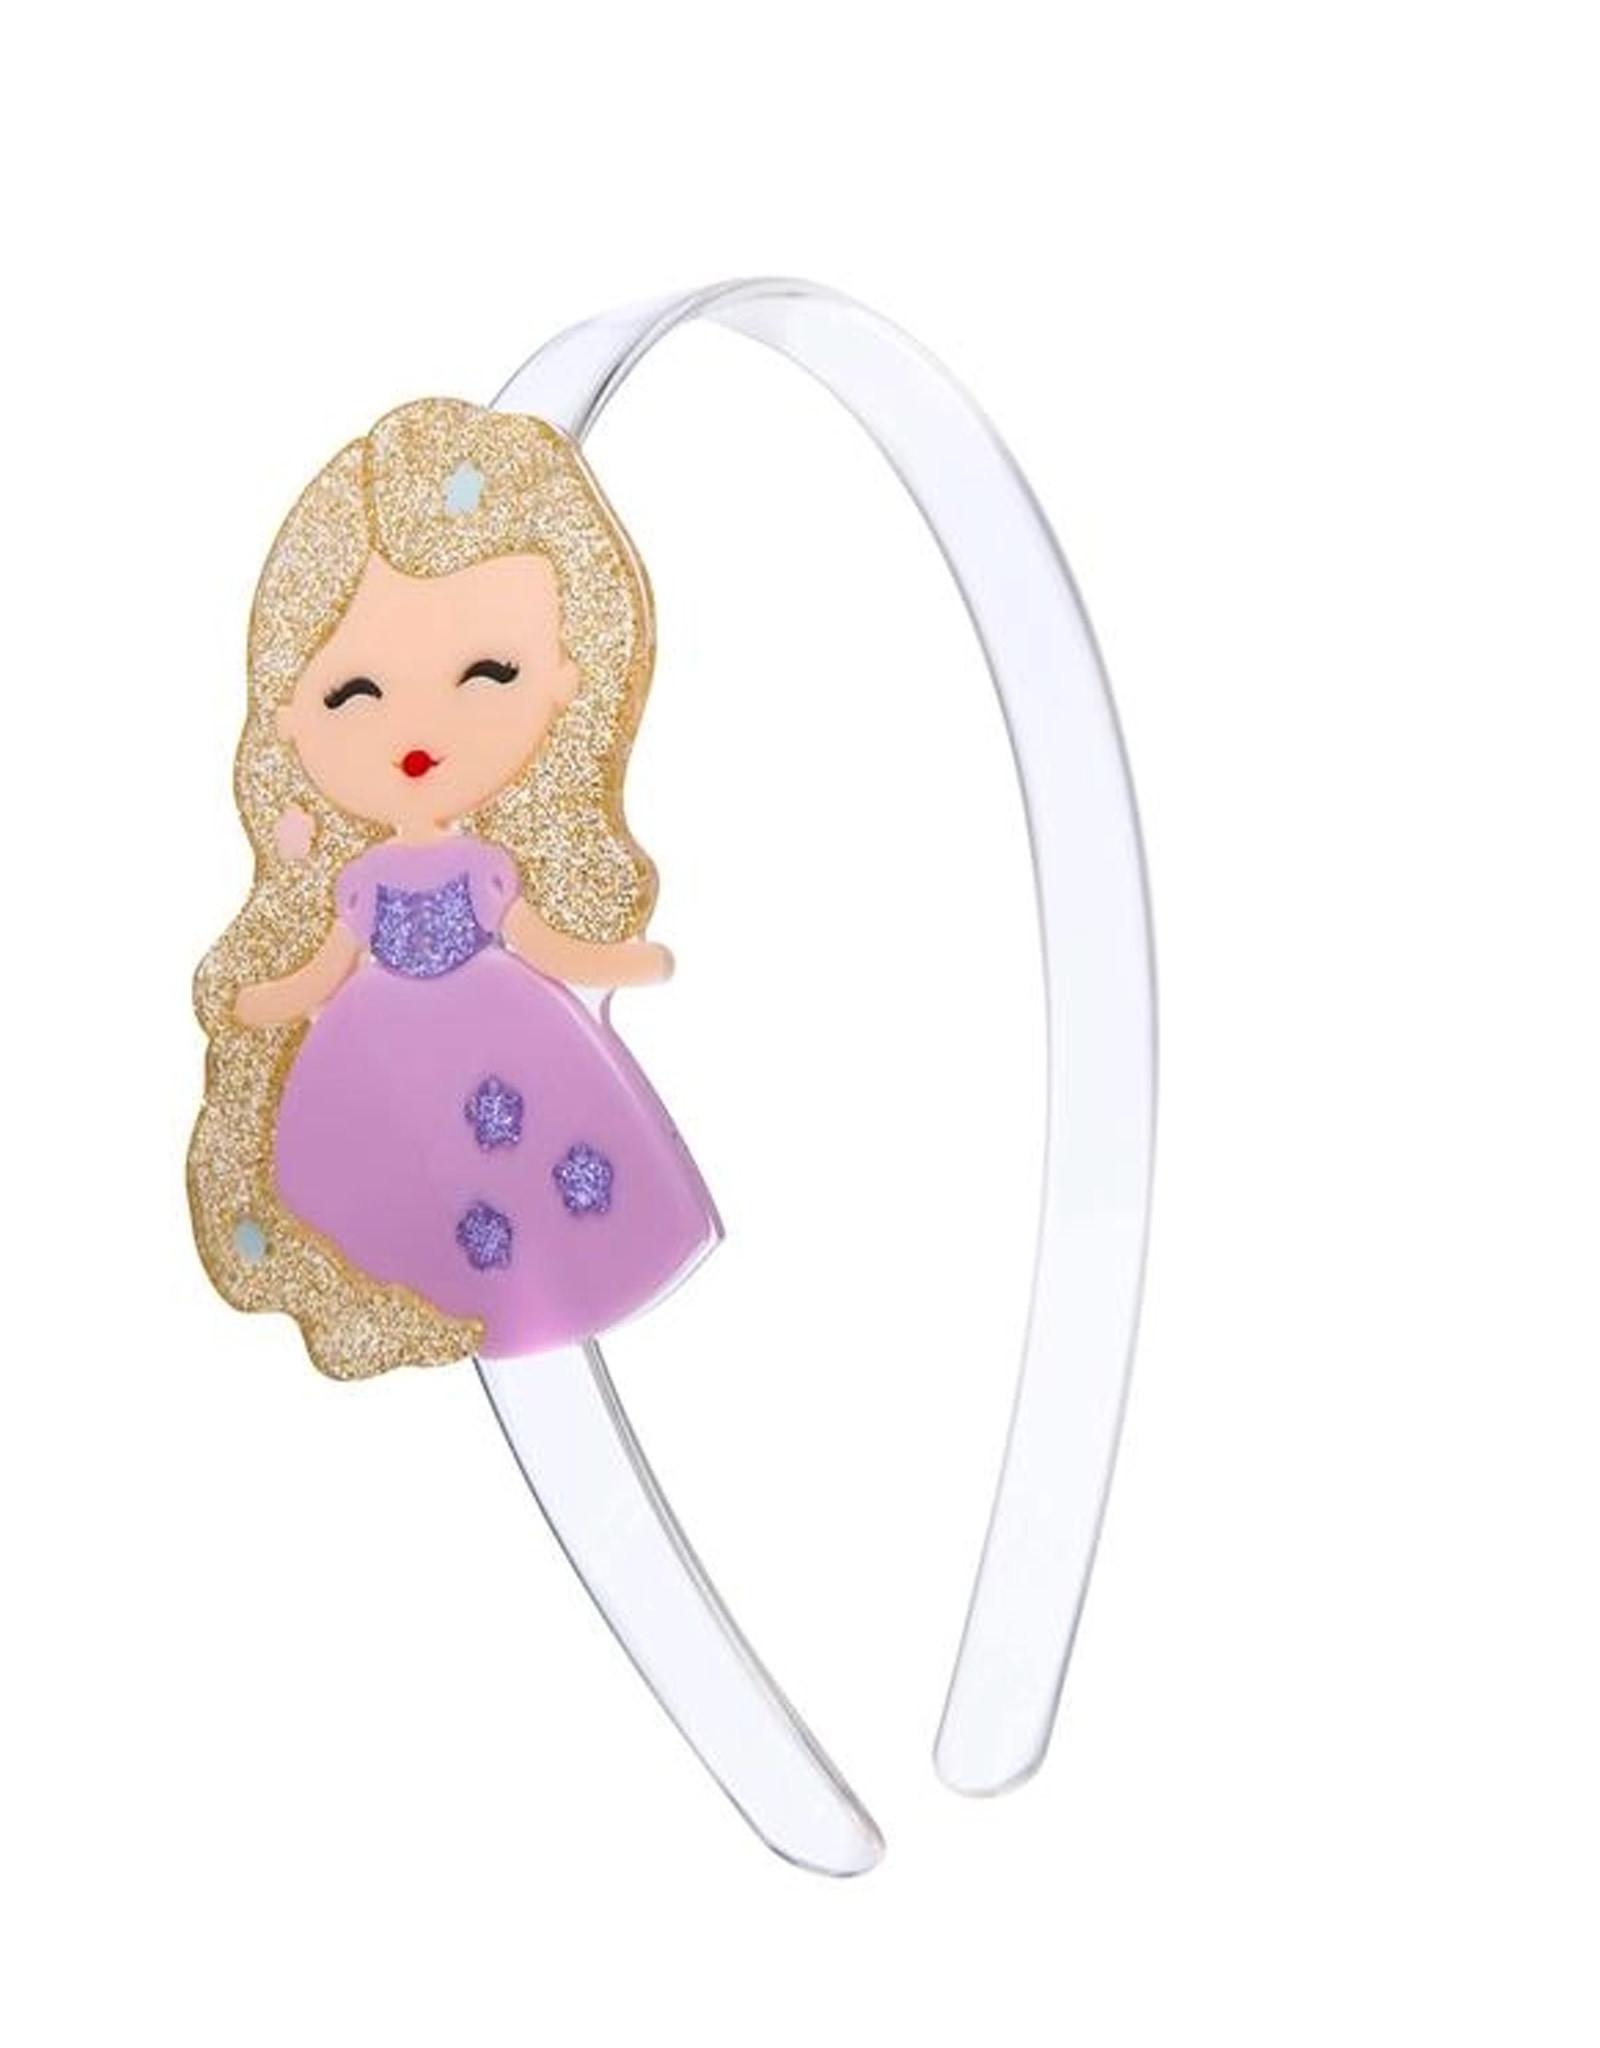 Lillies & Roses Headband Cute Doll w/ Long Hair